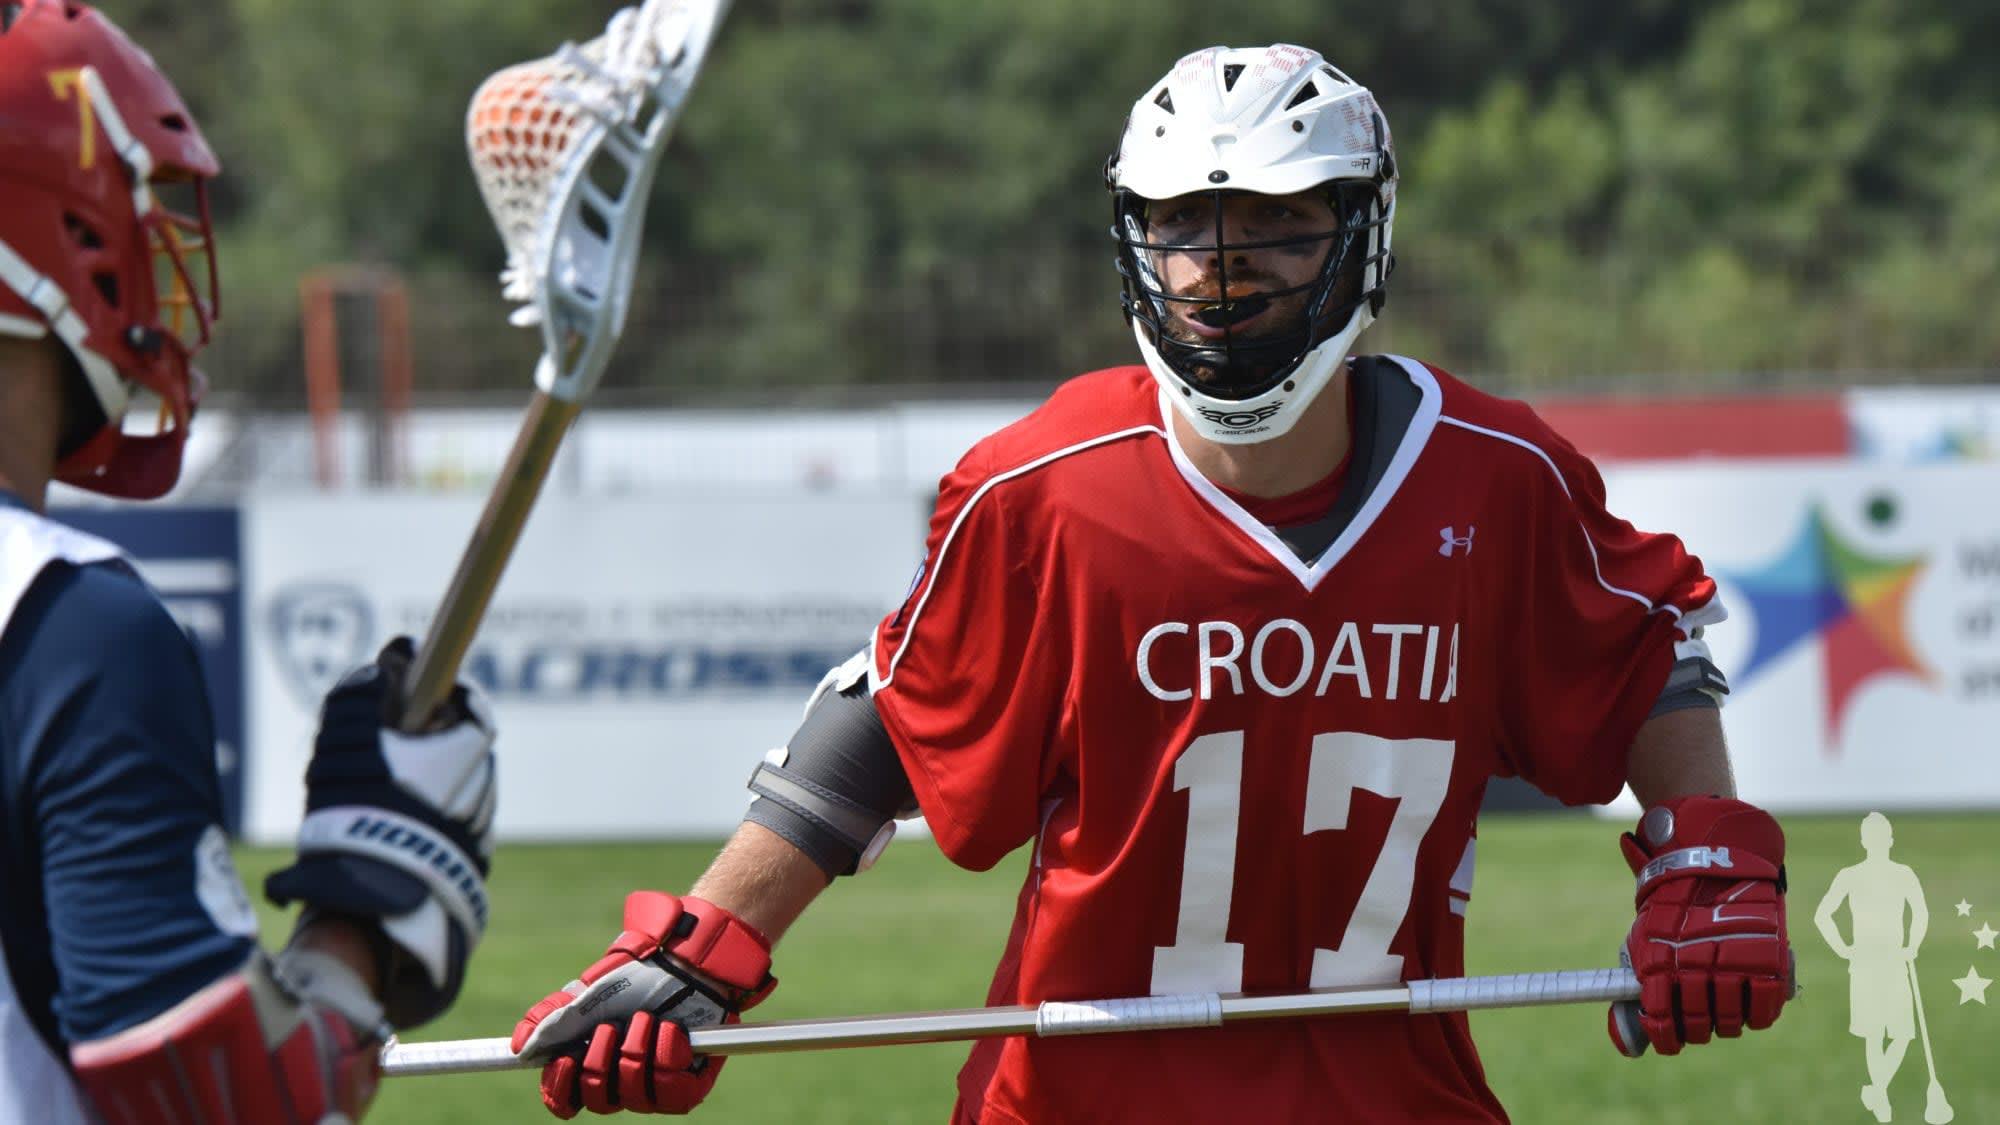 Croatia Spain Katie Conwell 2018 FIL World Lacrosse Championships world games